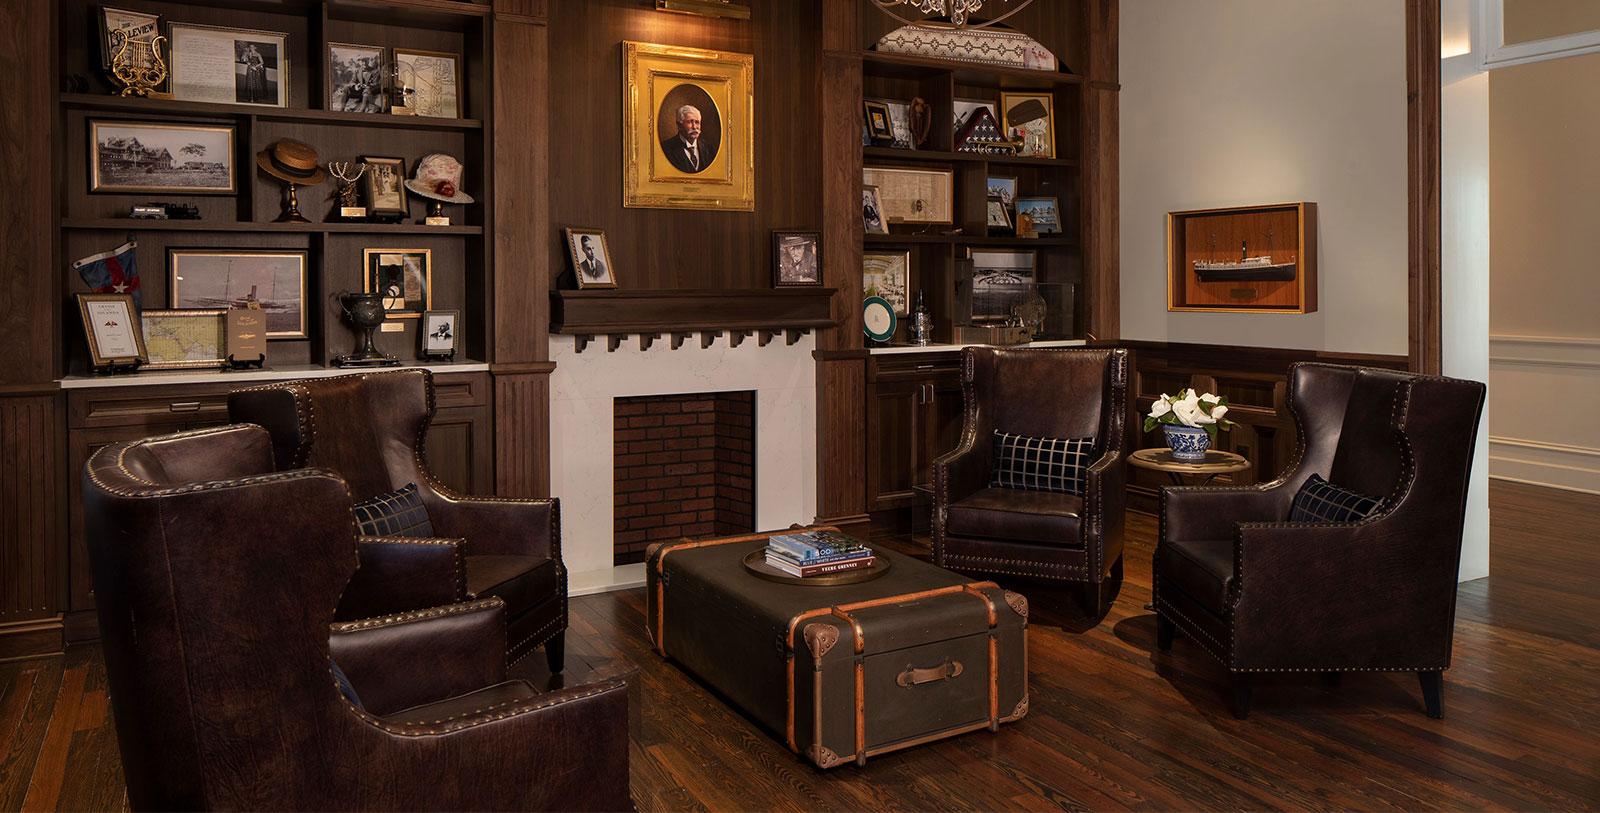 Image of Morton's Reading Room at Belleview Inn, 1897, Member of Historic Hotels of America, in Belleair, Florida, Hot Deals